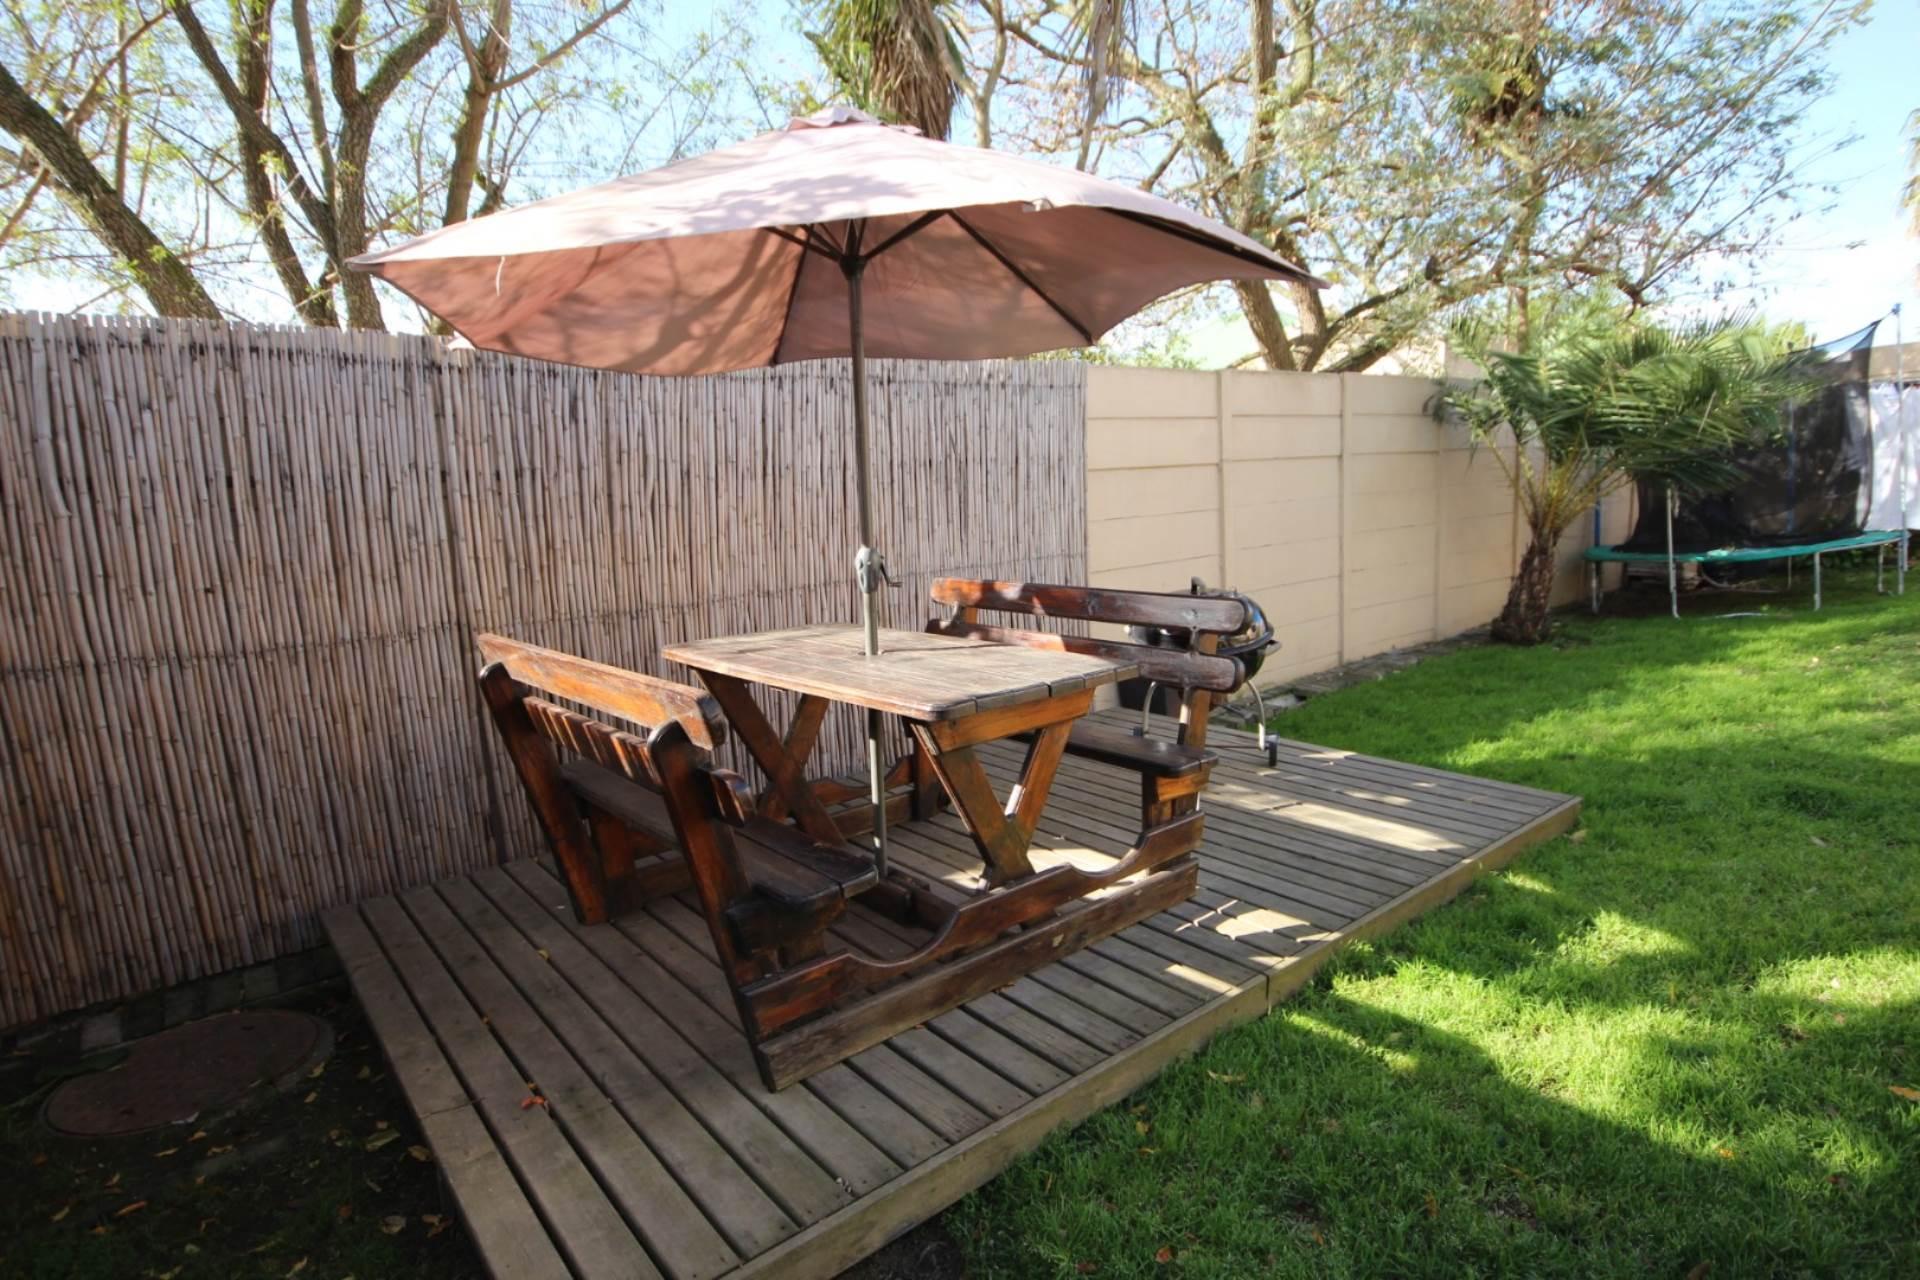 House pending sale in uitzicht durbanville western cape for r 1690000